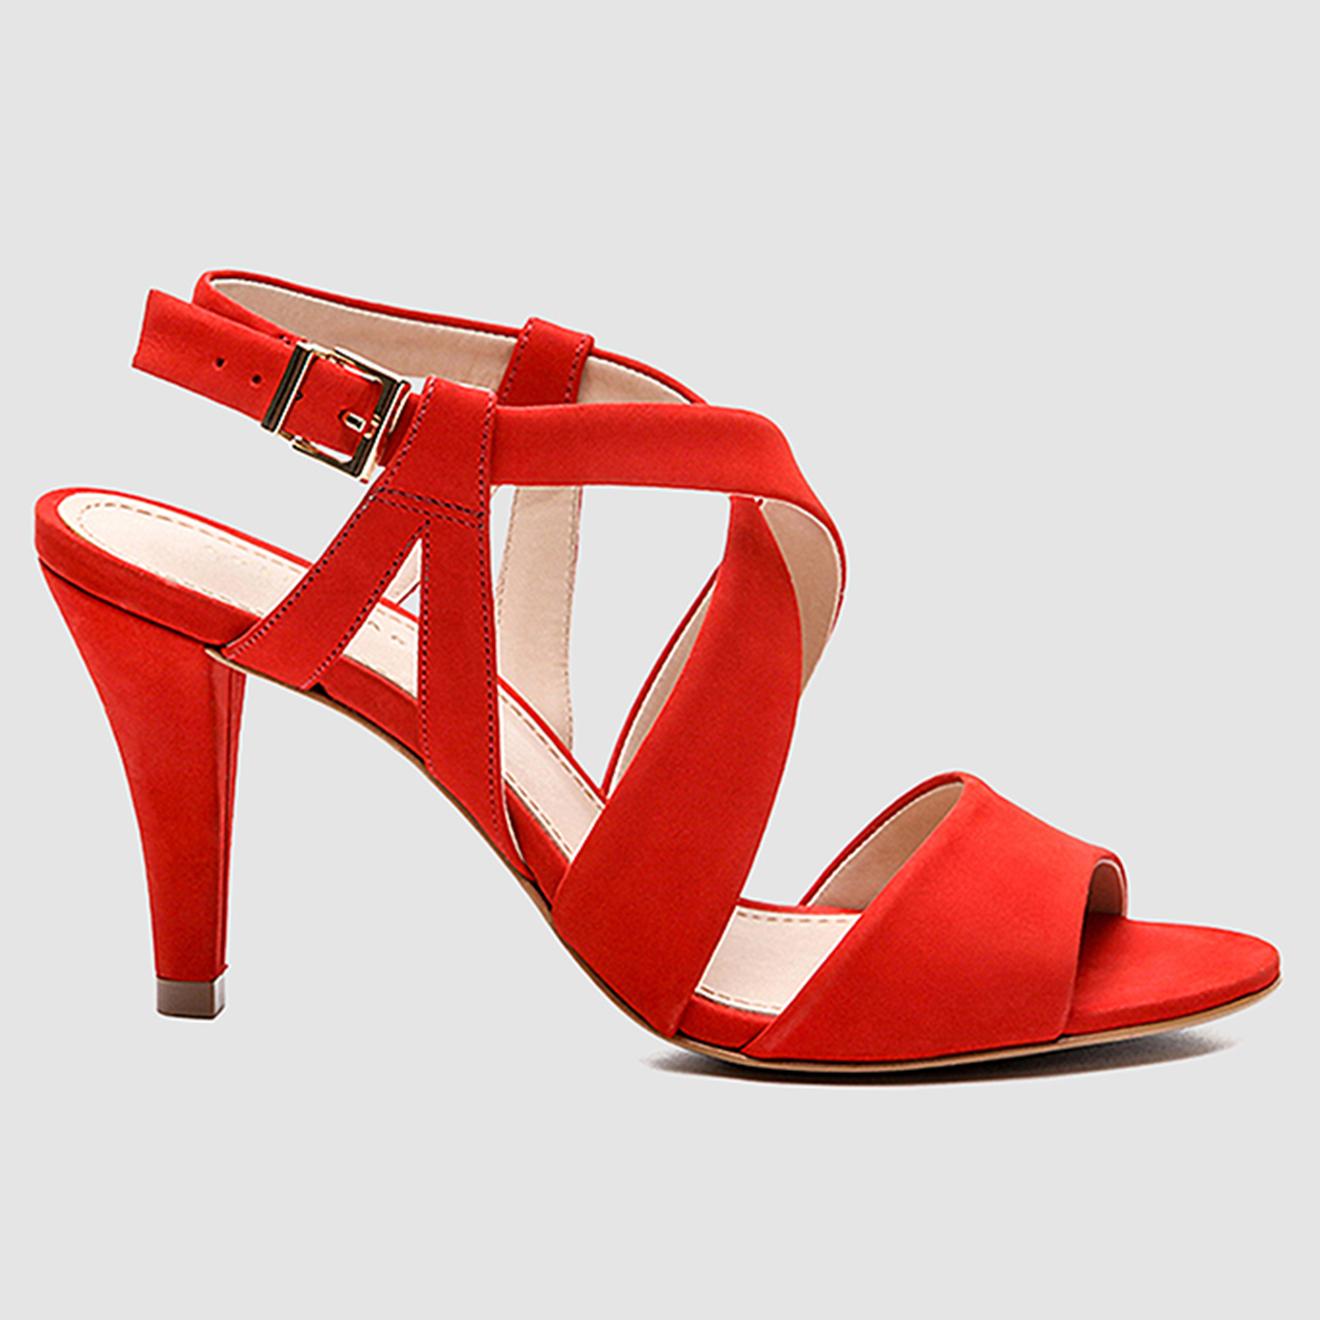 Sandales en Velours de Cuir Jiji - Talon 8 cm - Cosmoparis - Modalova